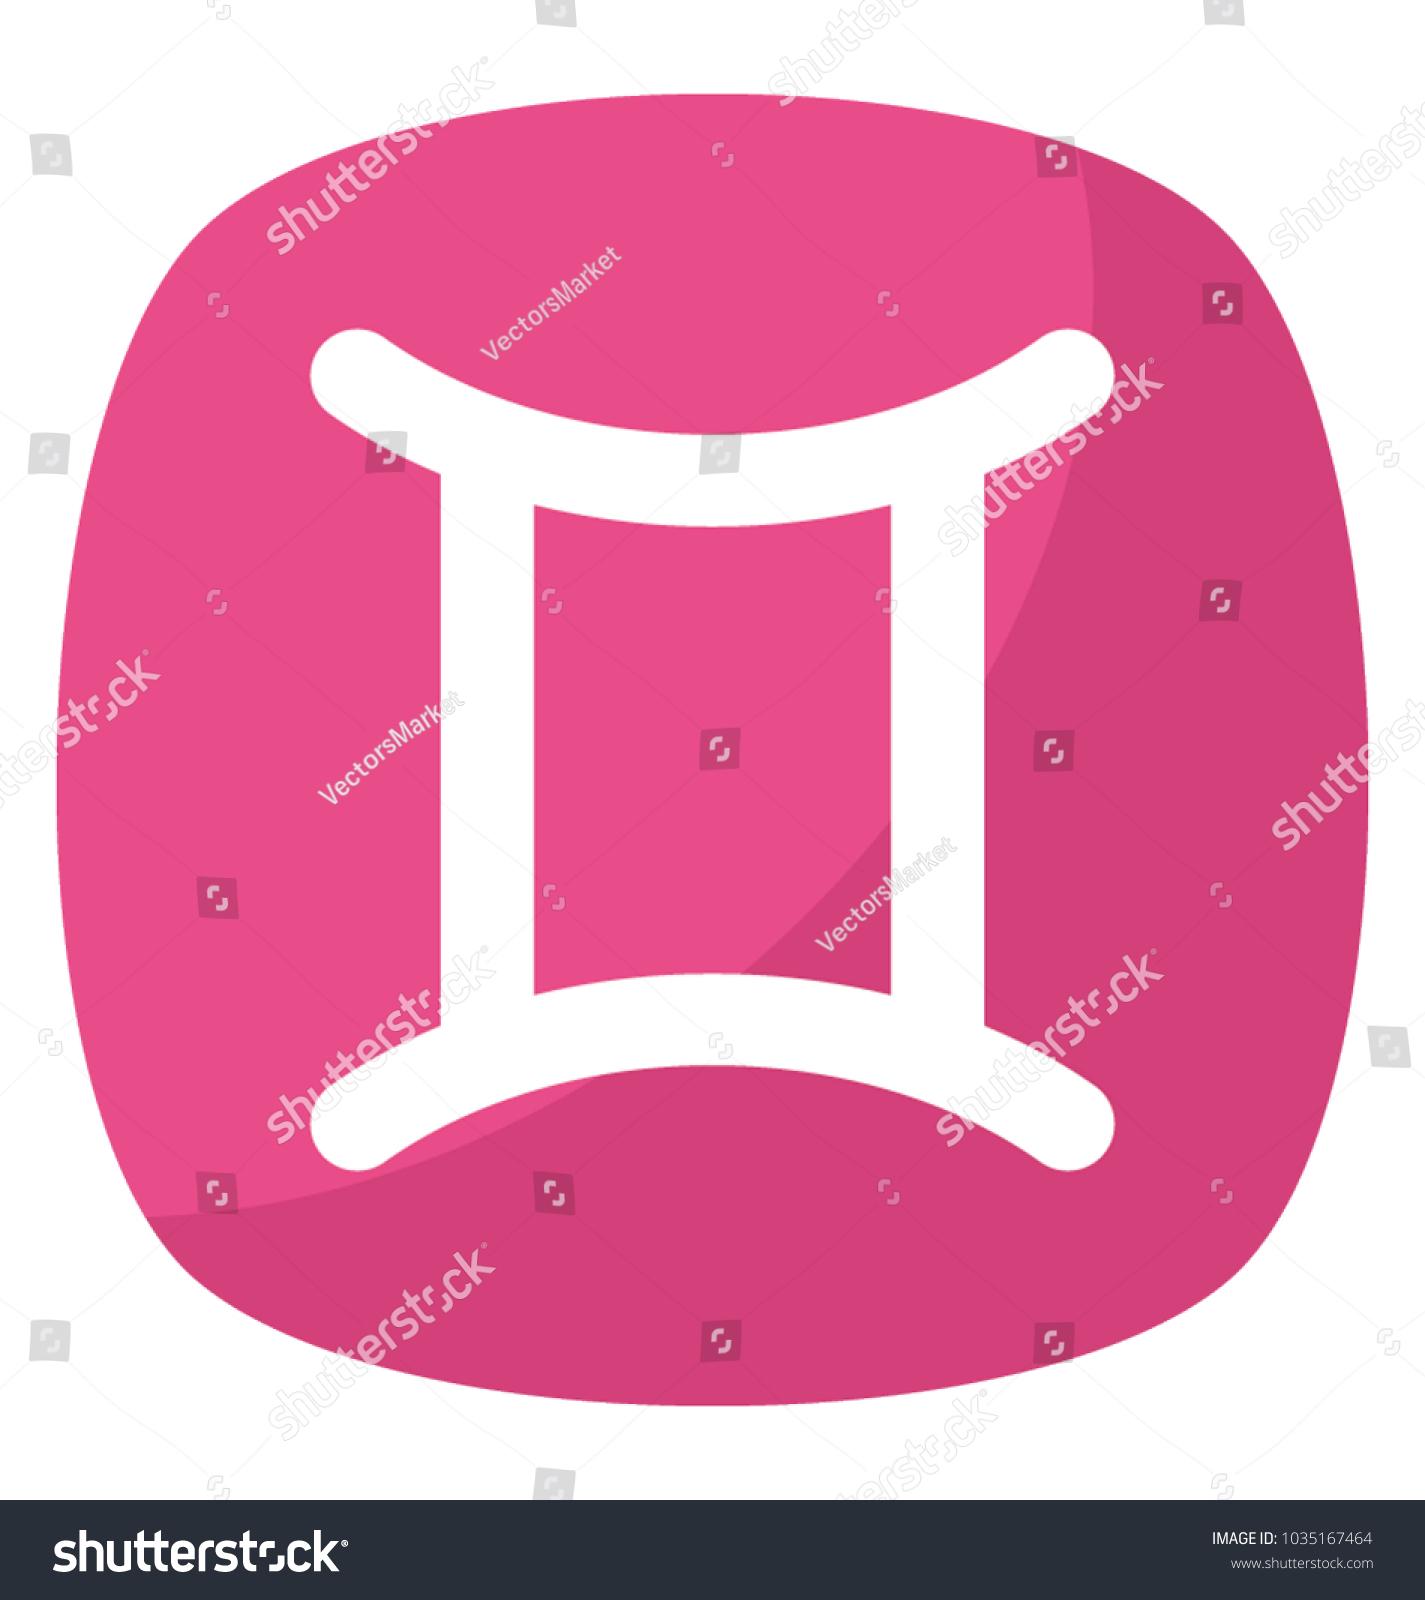 Gemini star sign symbol gallery symbol and sign ideas third astrological sign gemini zodiac symbol stock vector third astrological sign gemini zodiac symbol buycottarizona buycottarizona